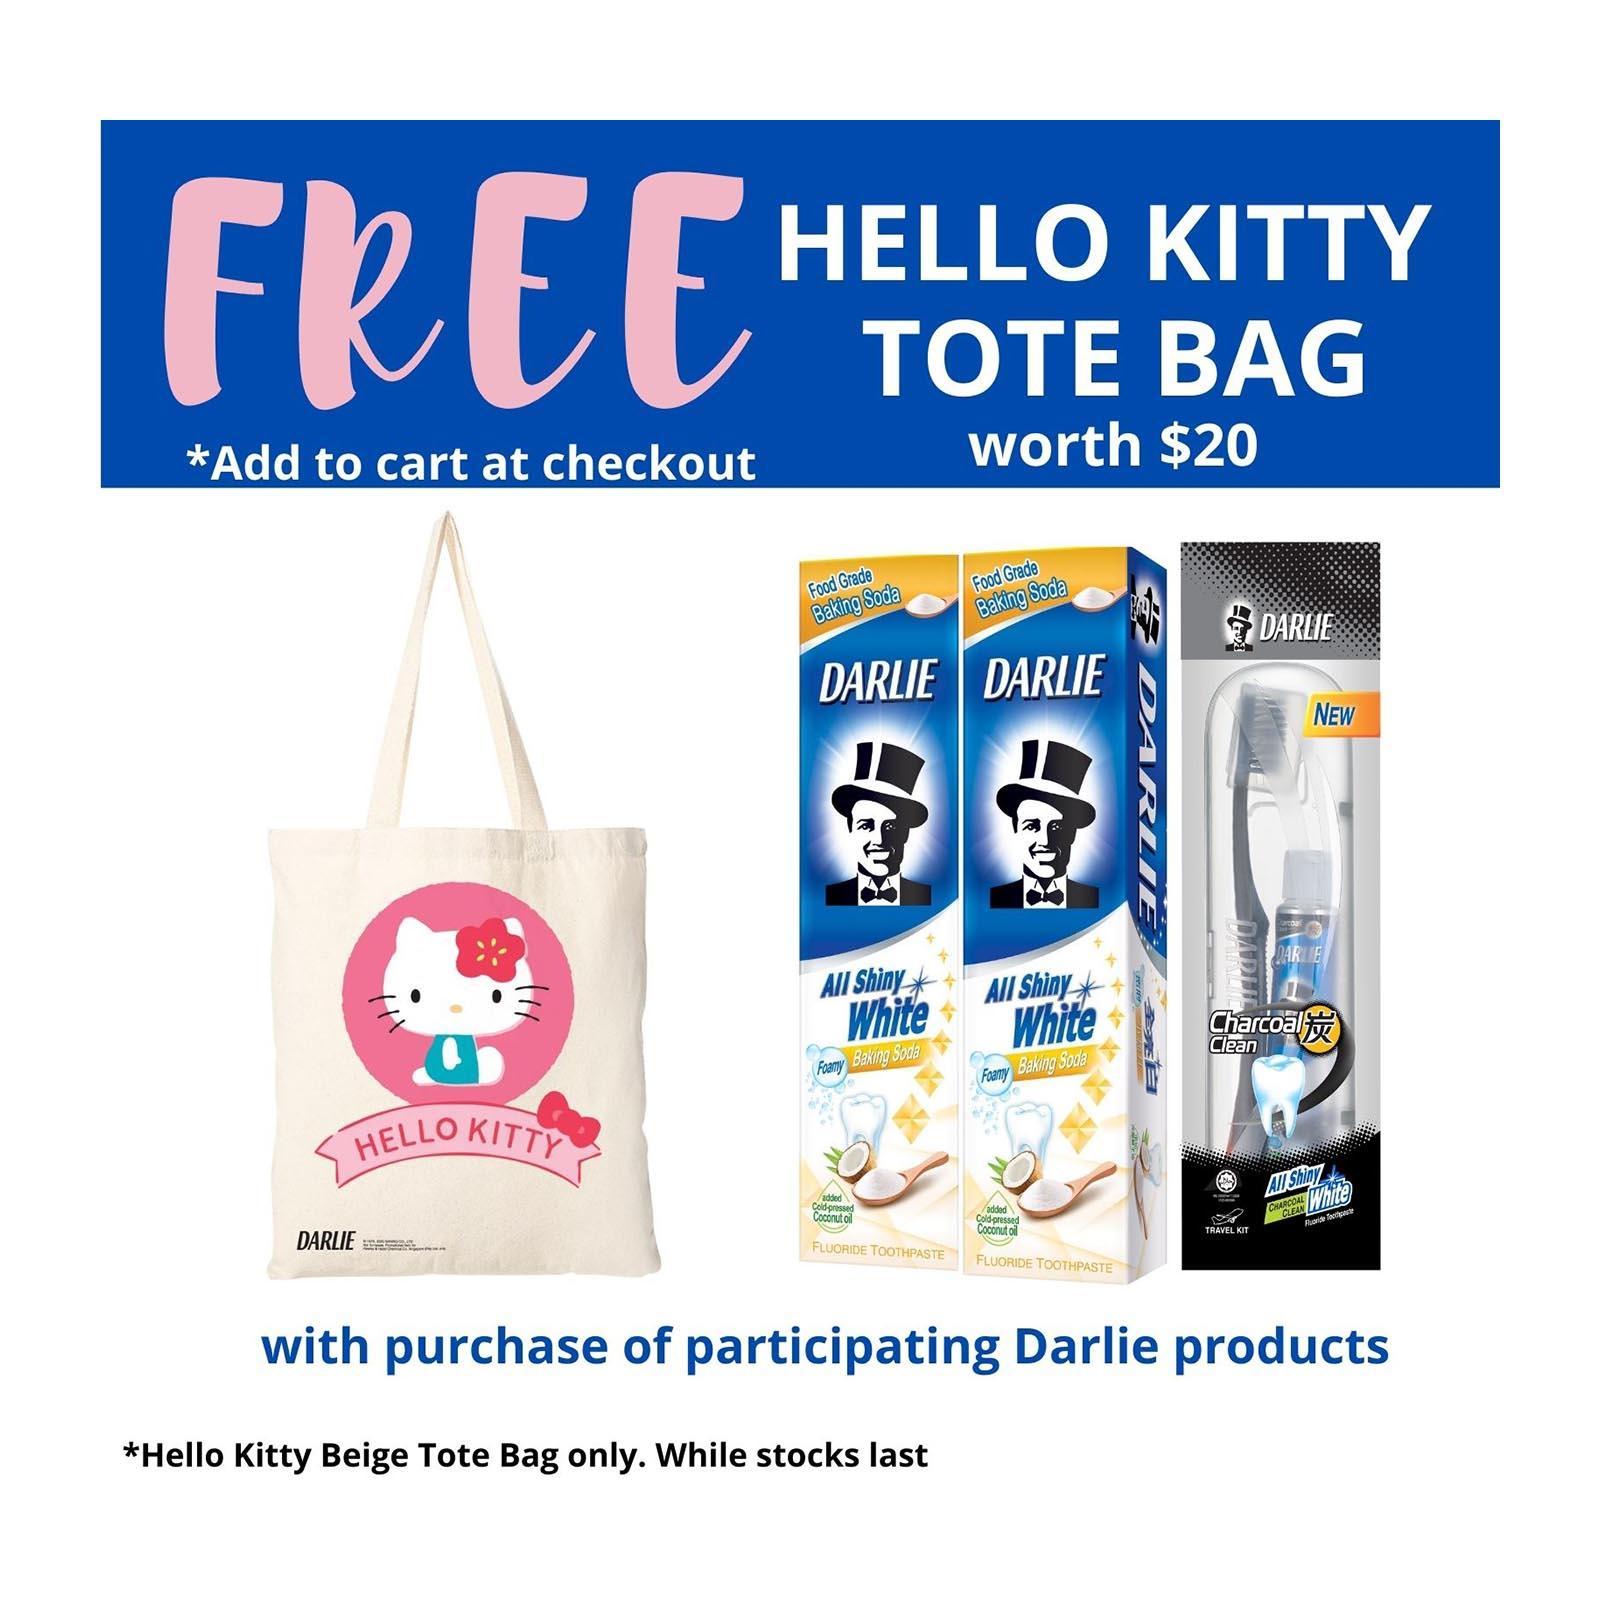 Darlie All Shiny White Baking Soda Whitening Toothpaste + FREE Travel Kit